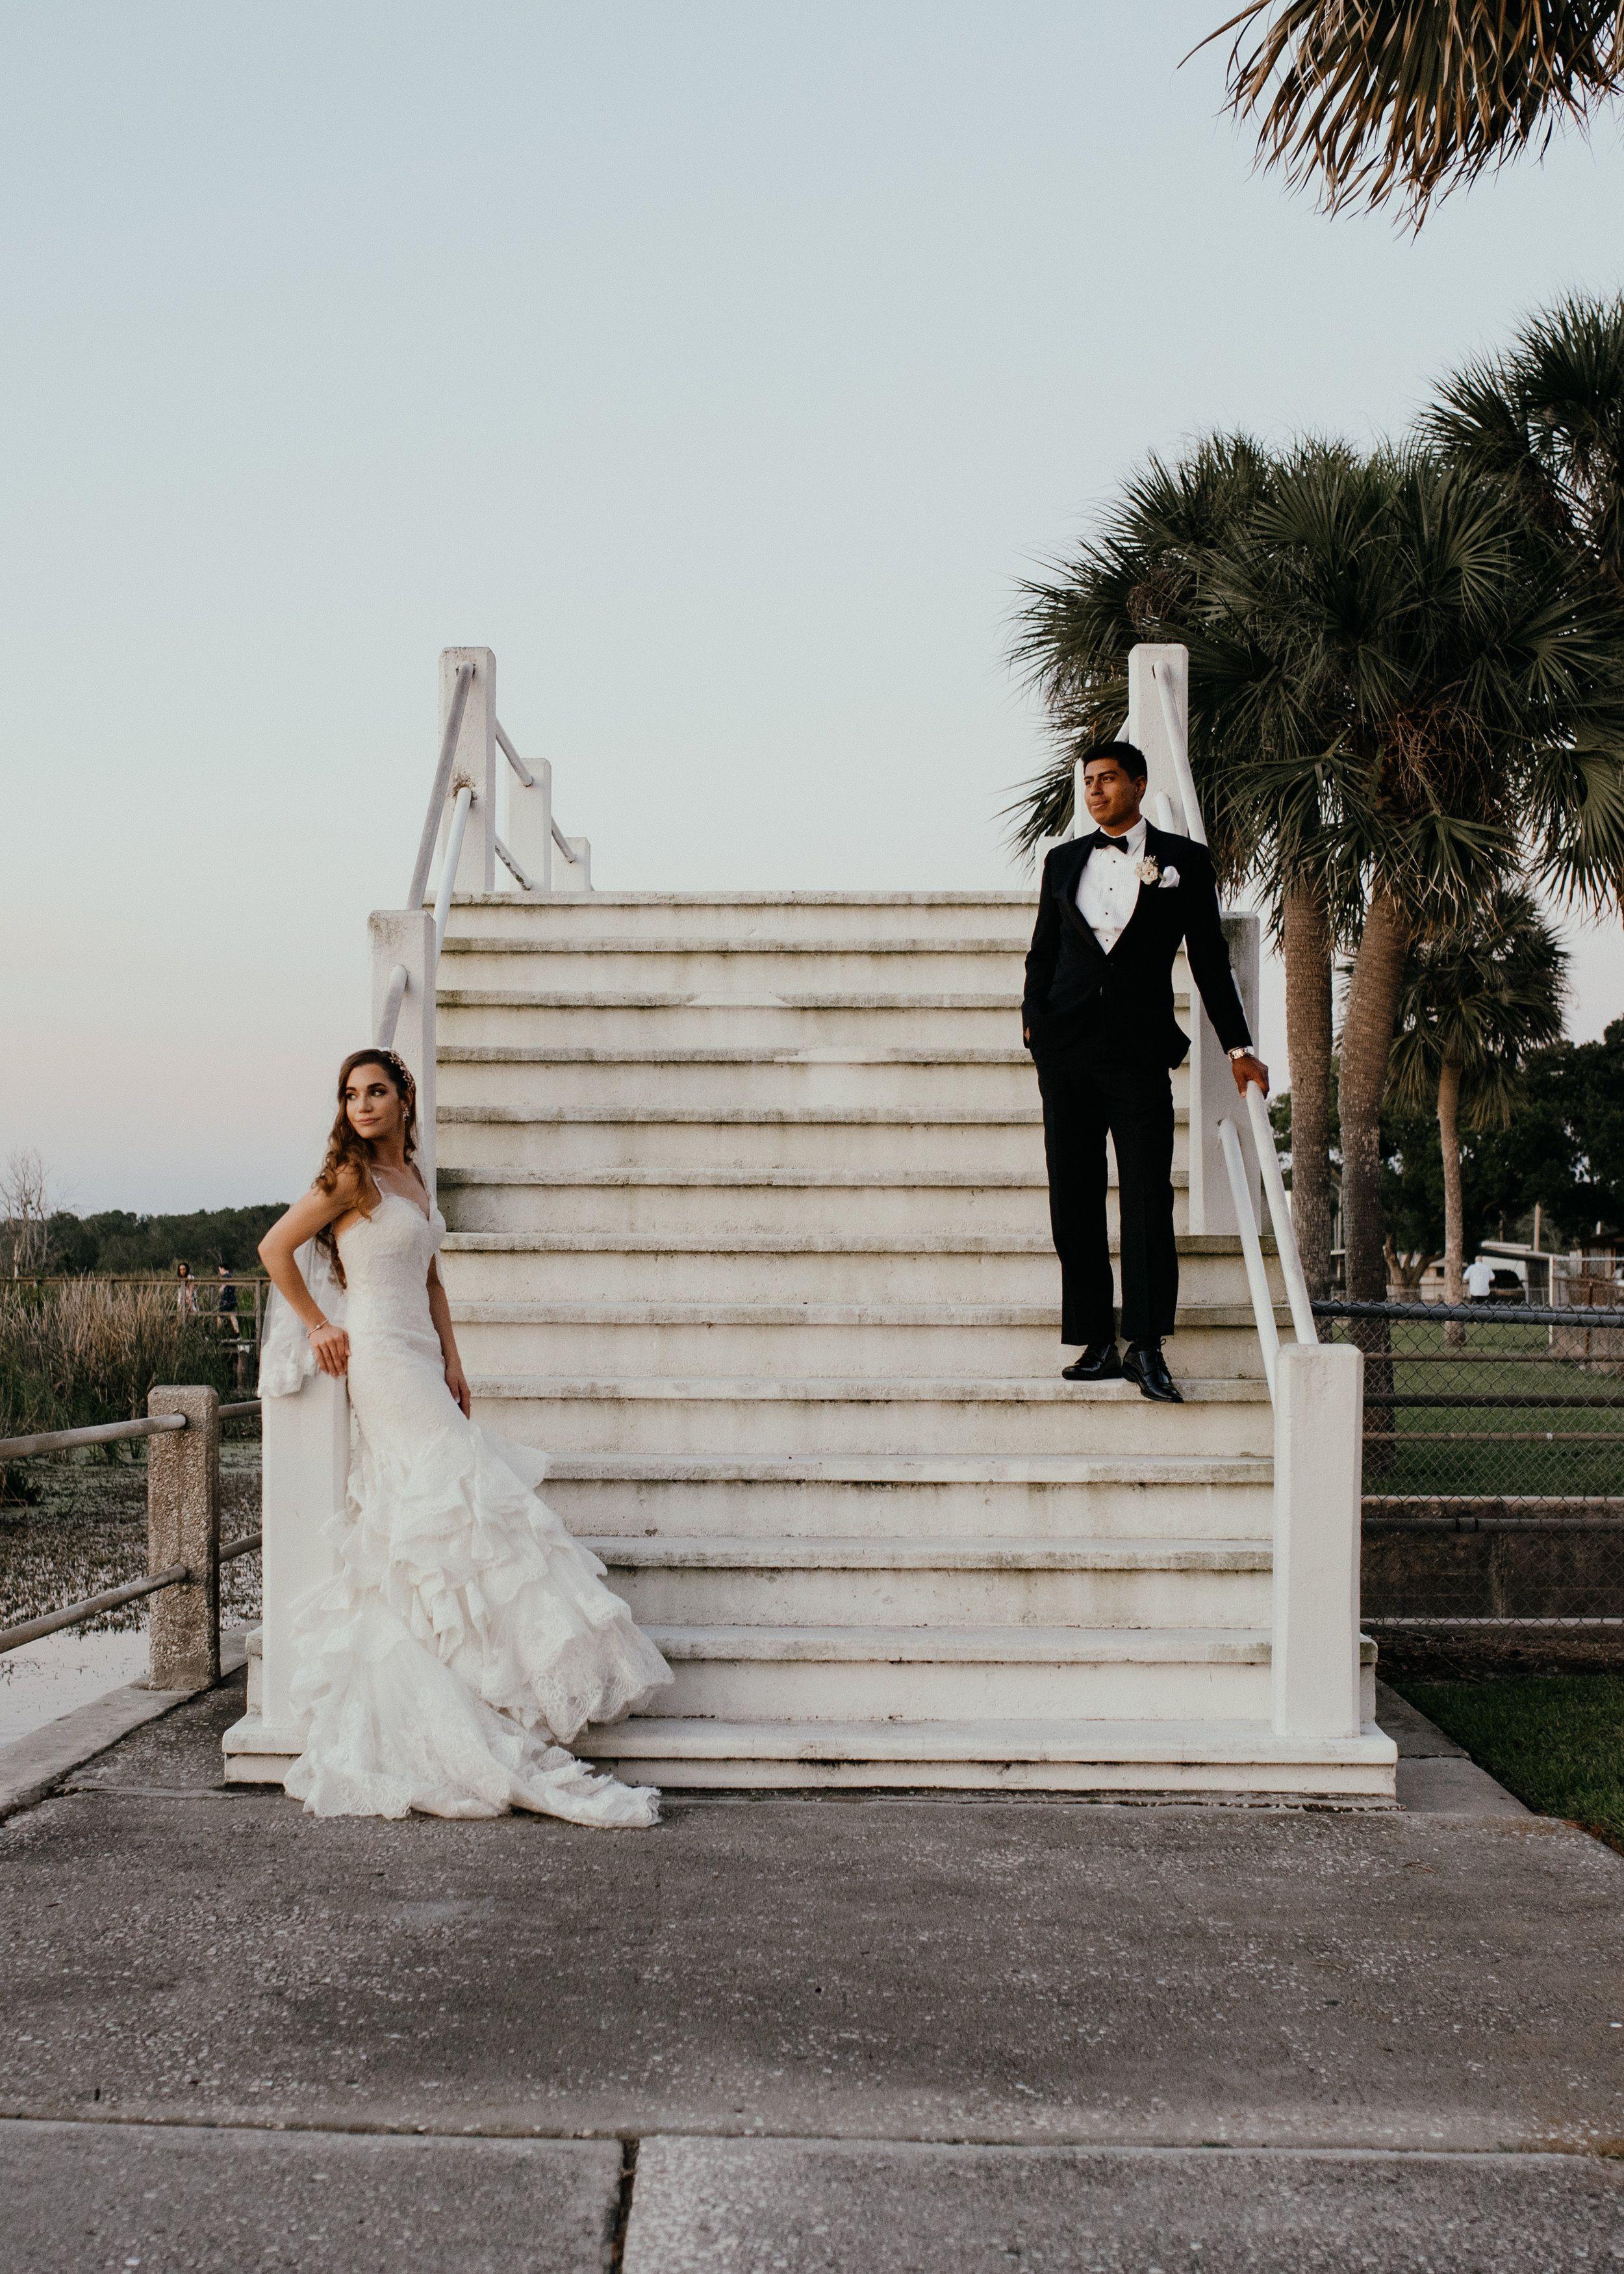 Gio Morales Best Wedding Photography Florida Jpg 600 400 Pixels Best Wedding Photographers Florida Wedding Photographer Fun Wedding Photography